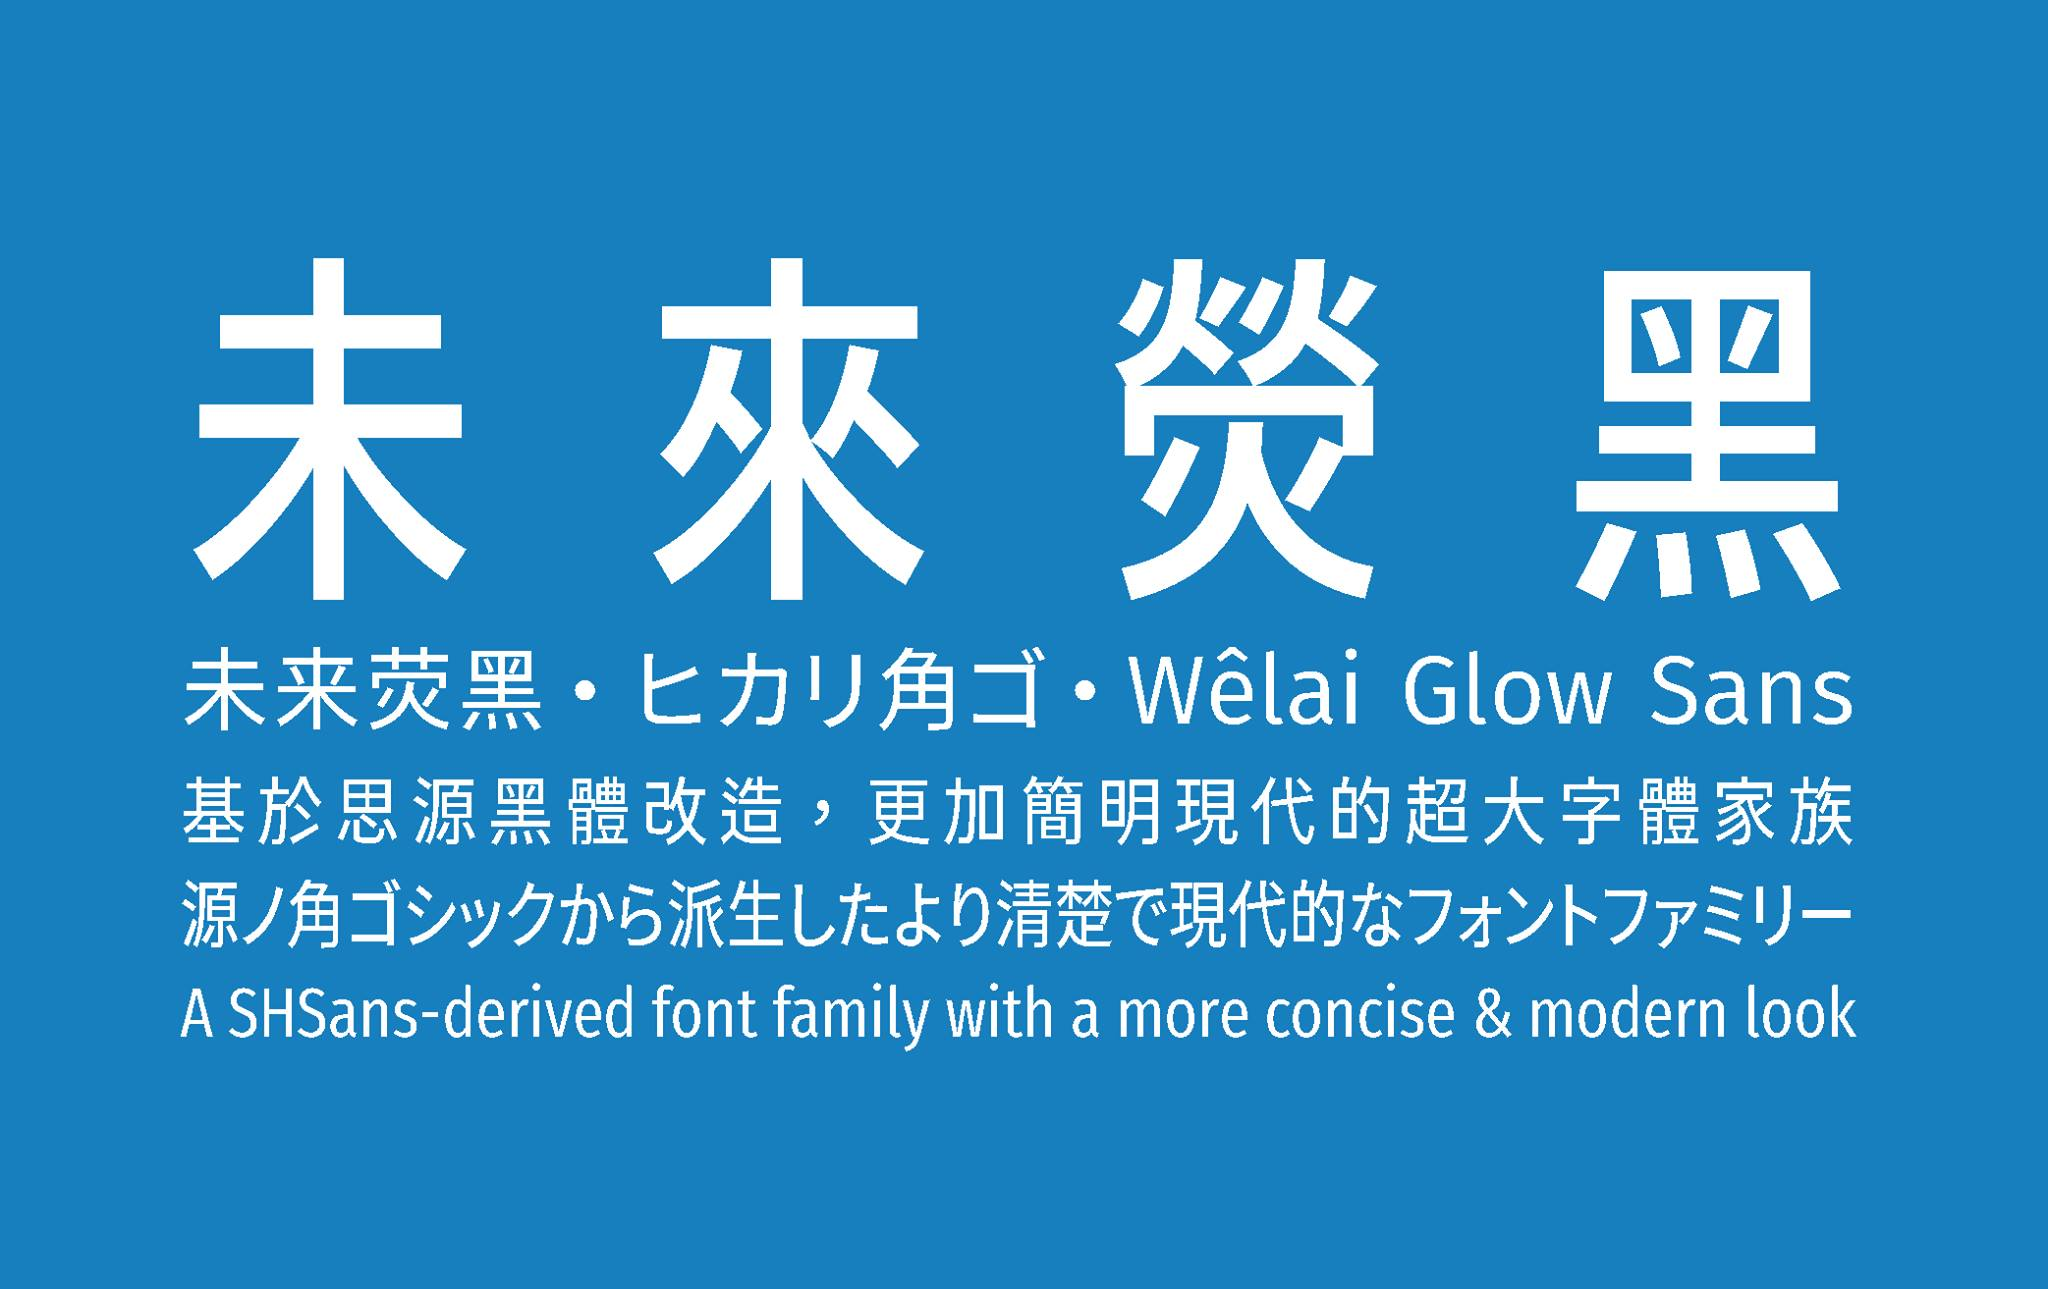 未来荧黑\未來熒黑\ヒカリ角ゴ\Wêlai Glow Sans